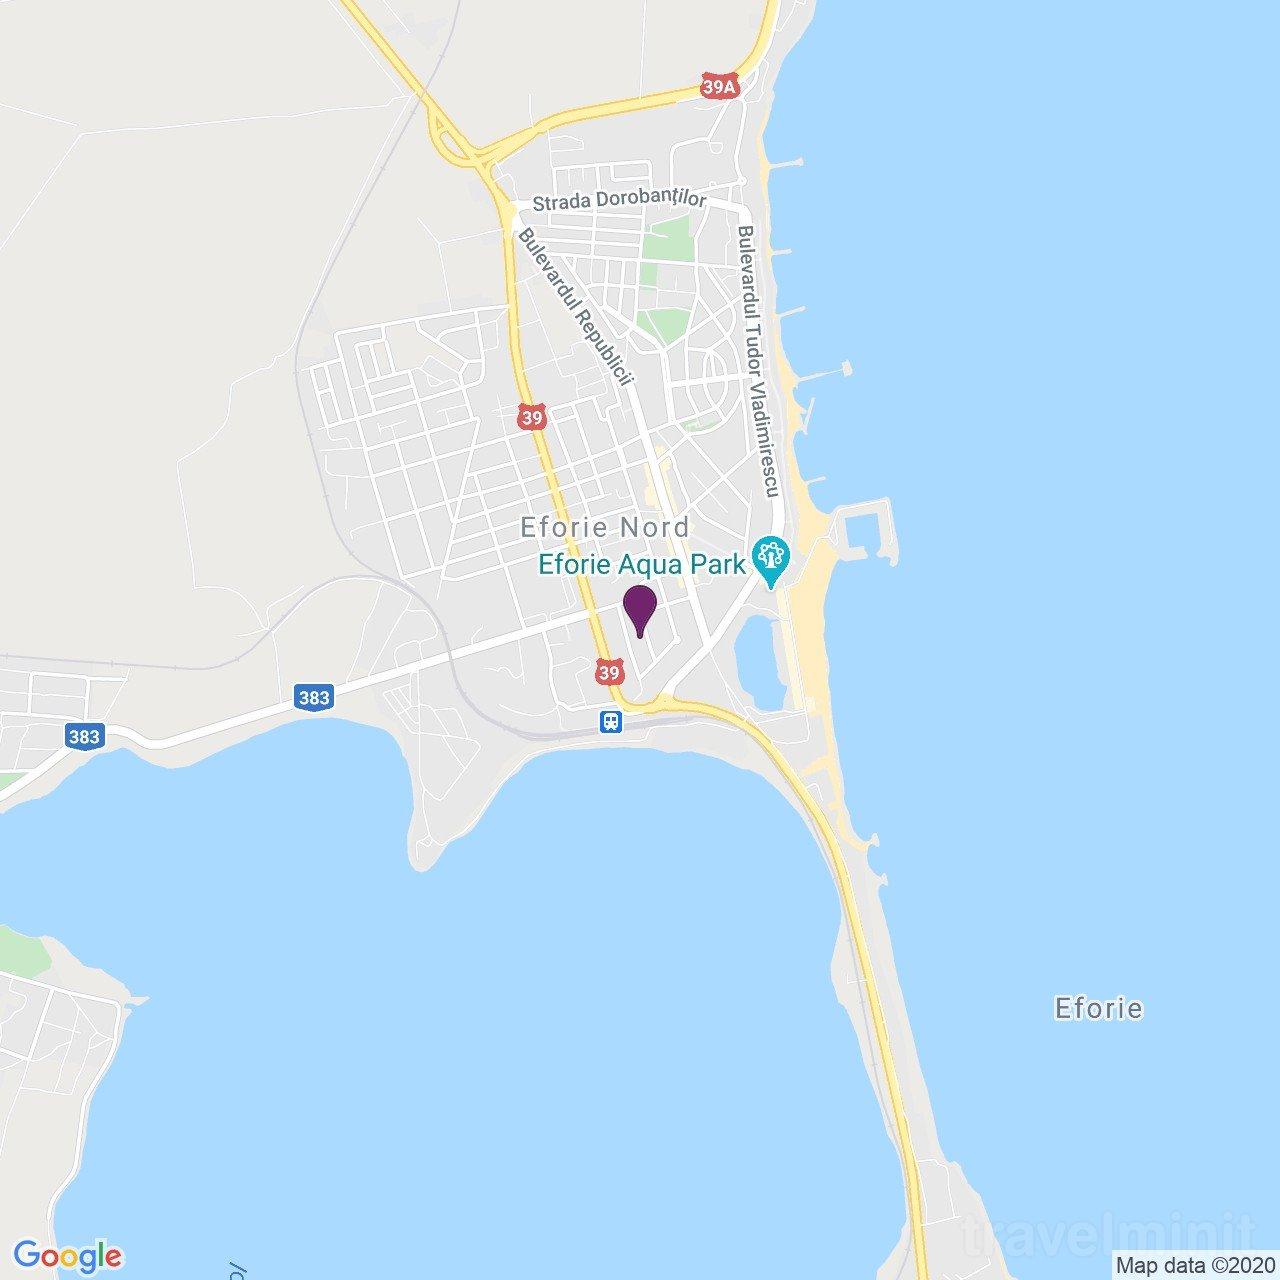 Hotel Fortuna Eforie Nord